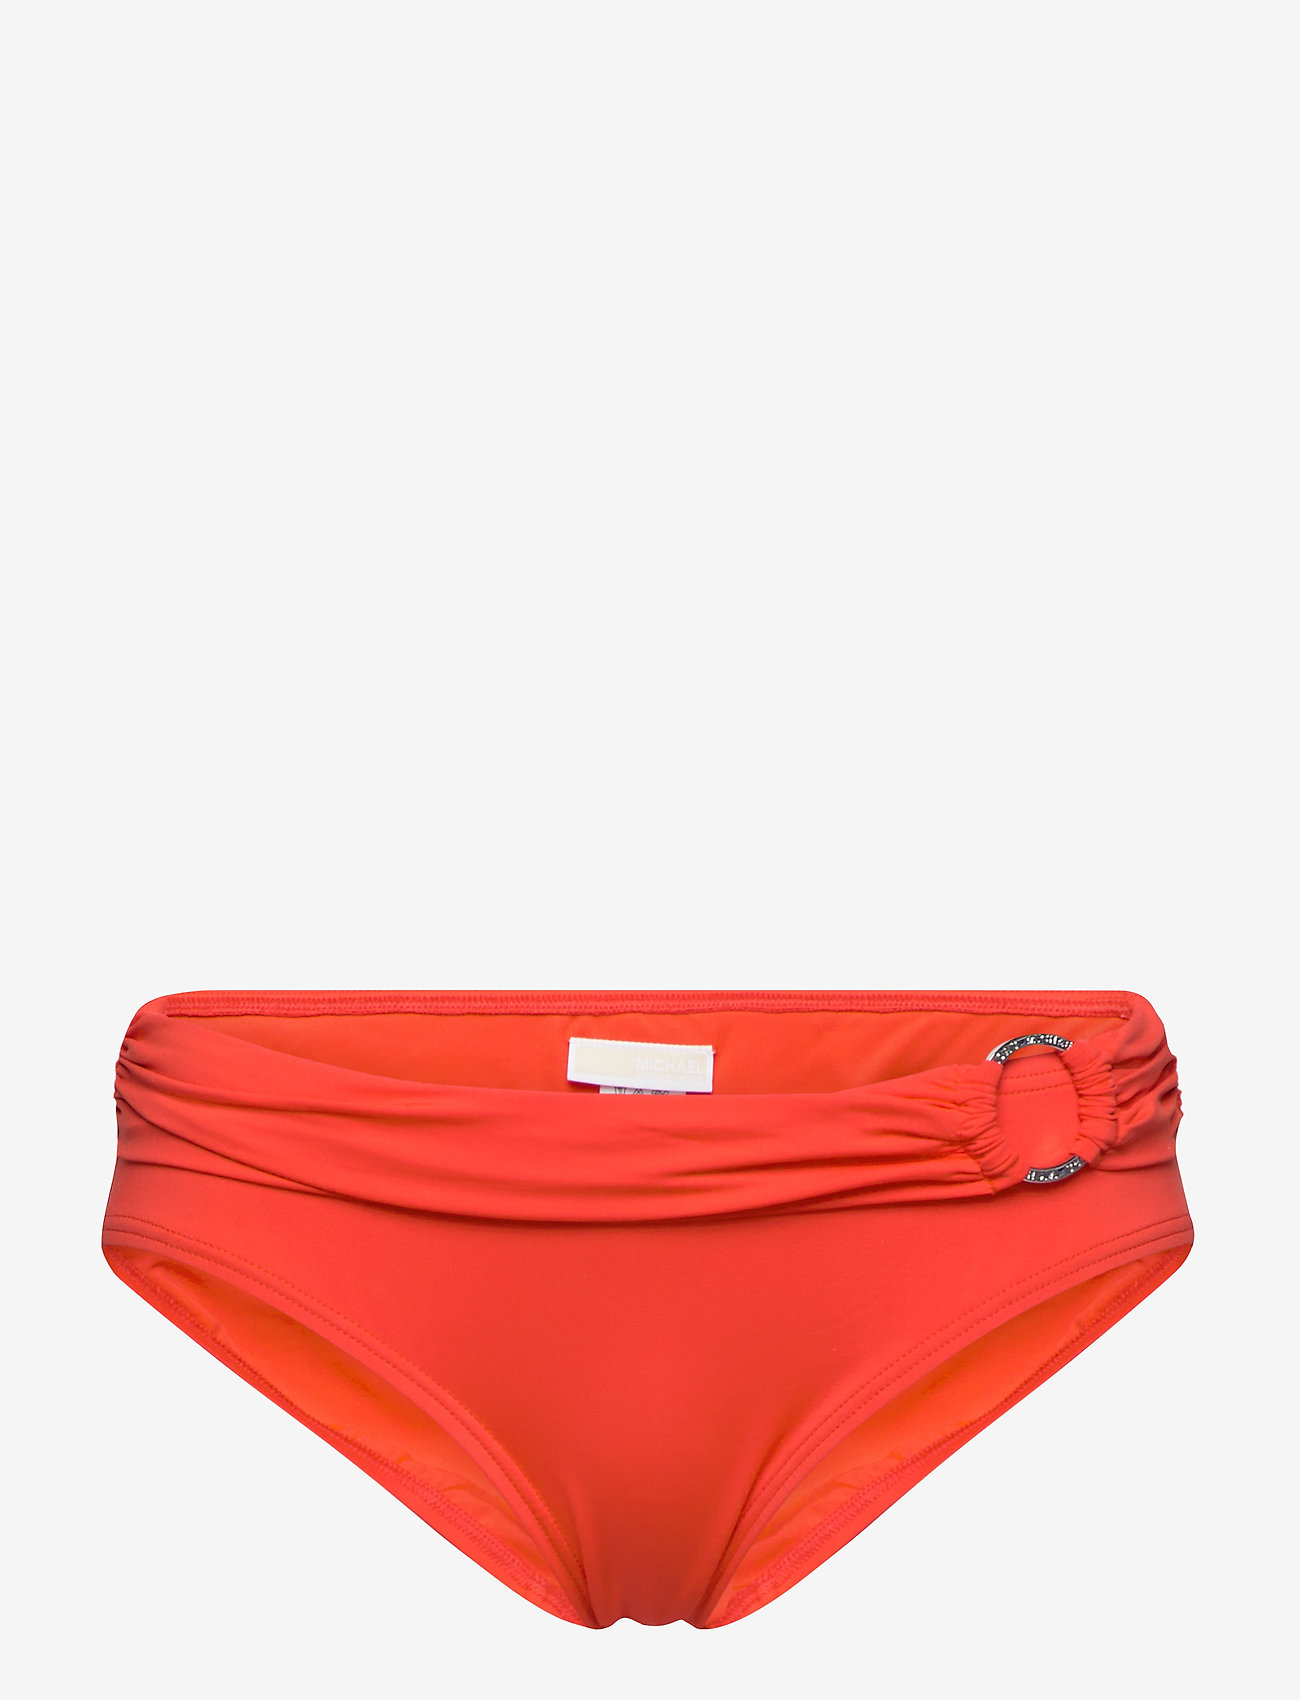 Michael Kors Swimwear - BIKINI BTM - bikinibroekjes - poppy - 0